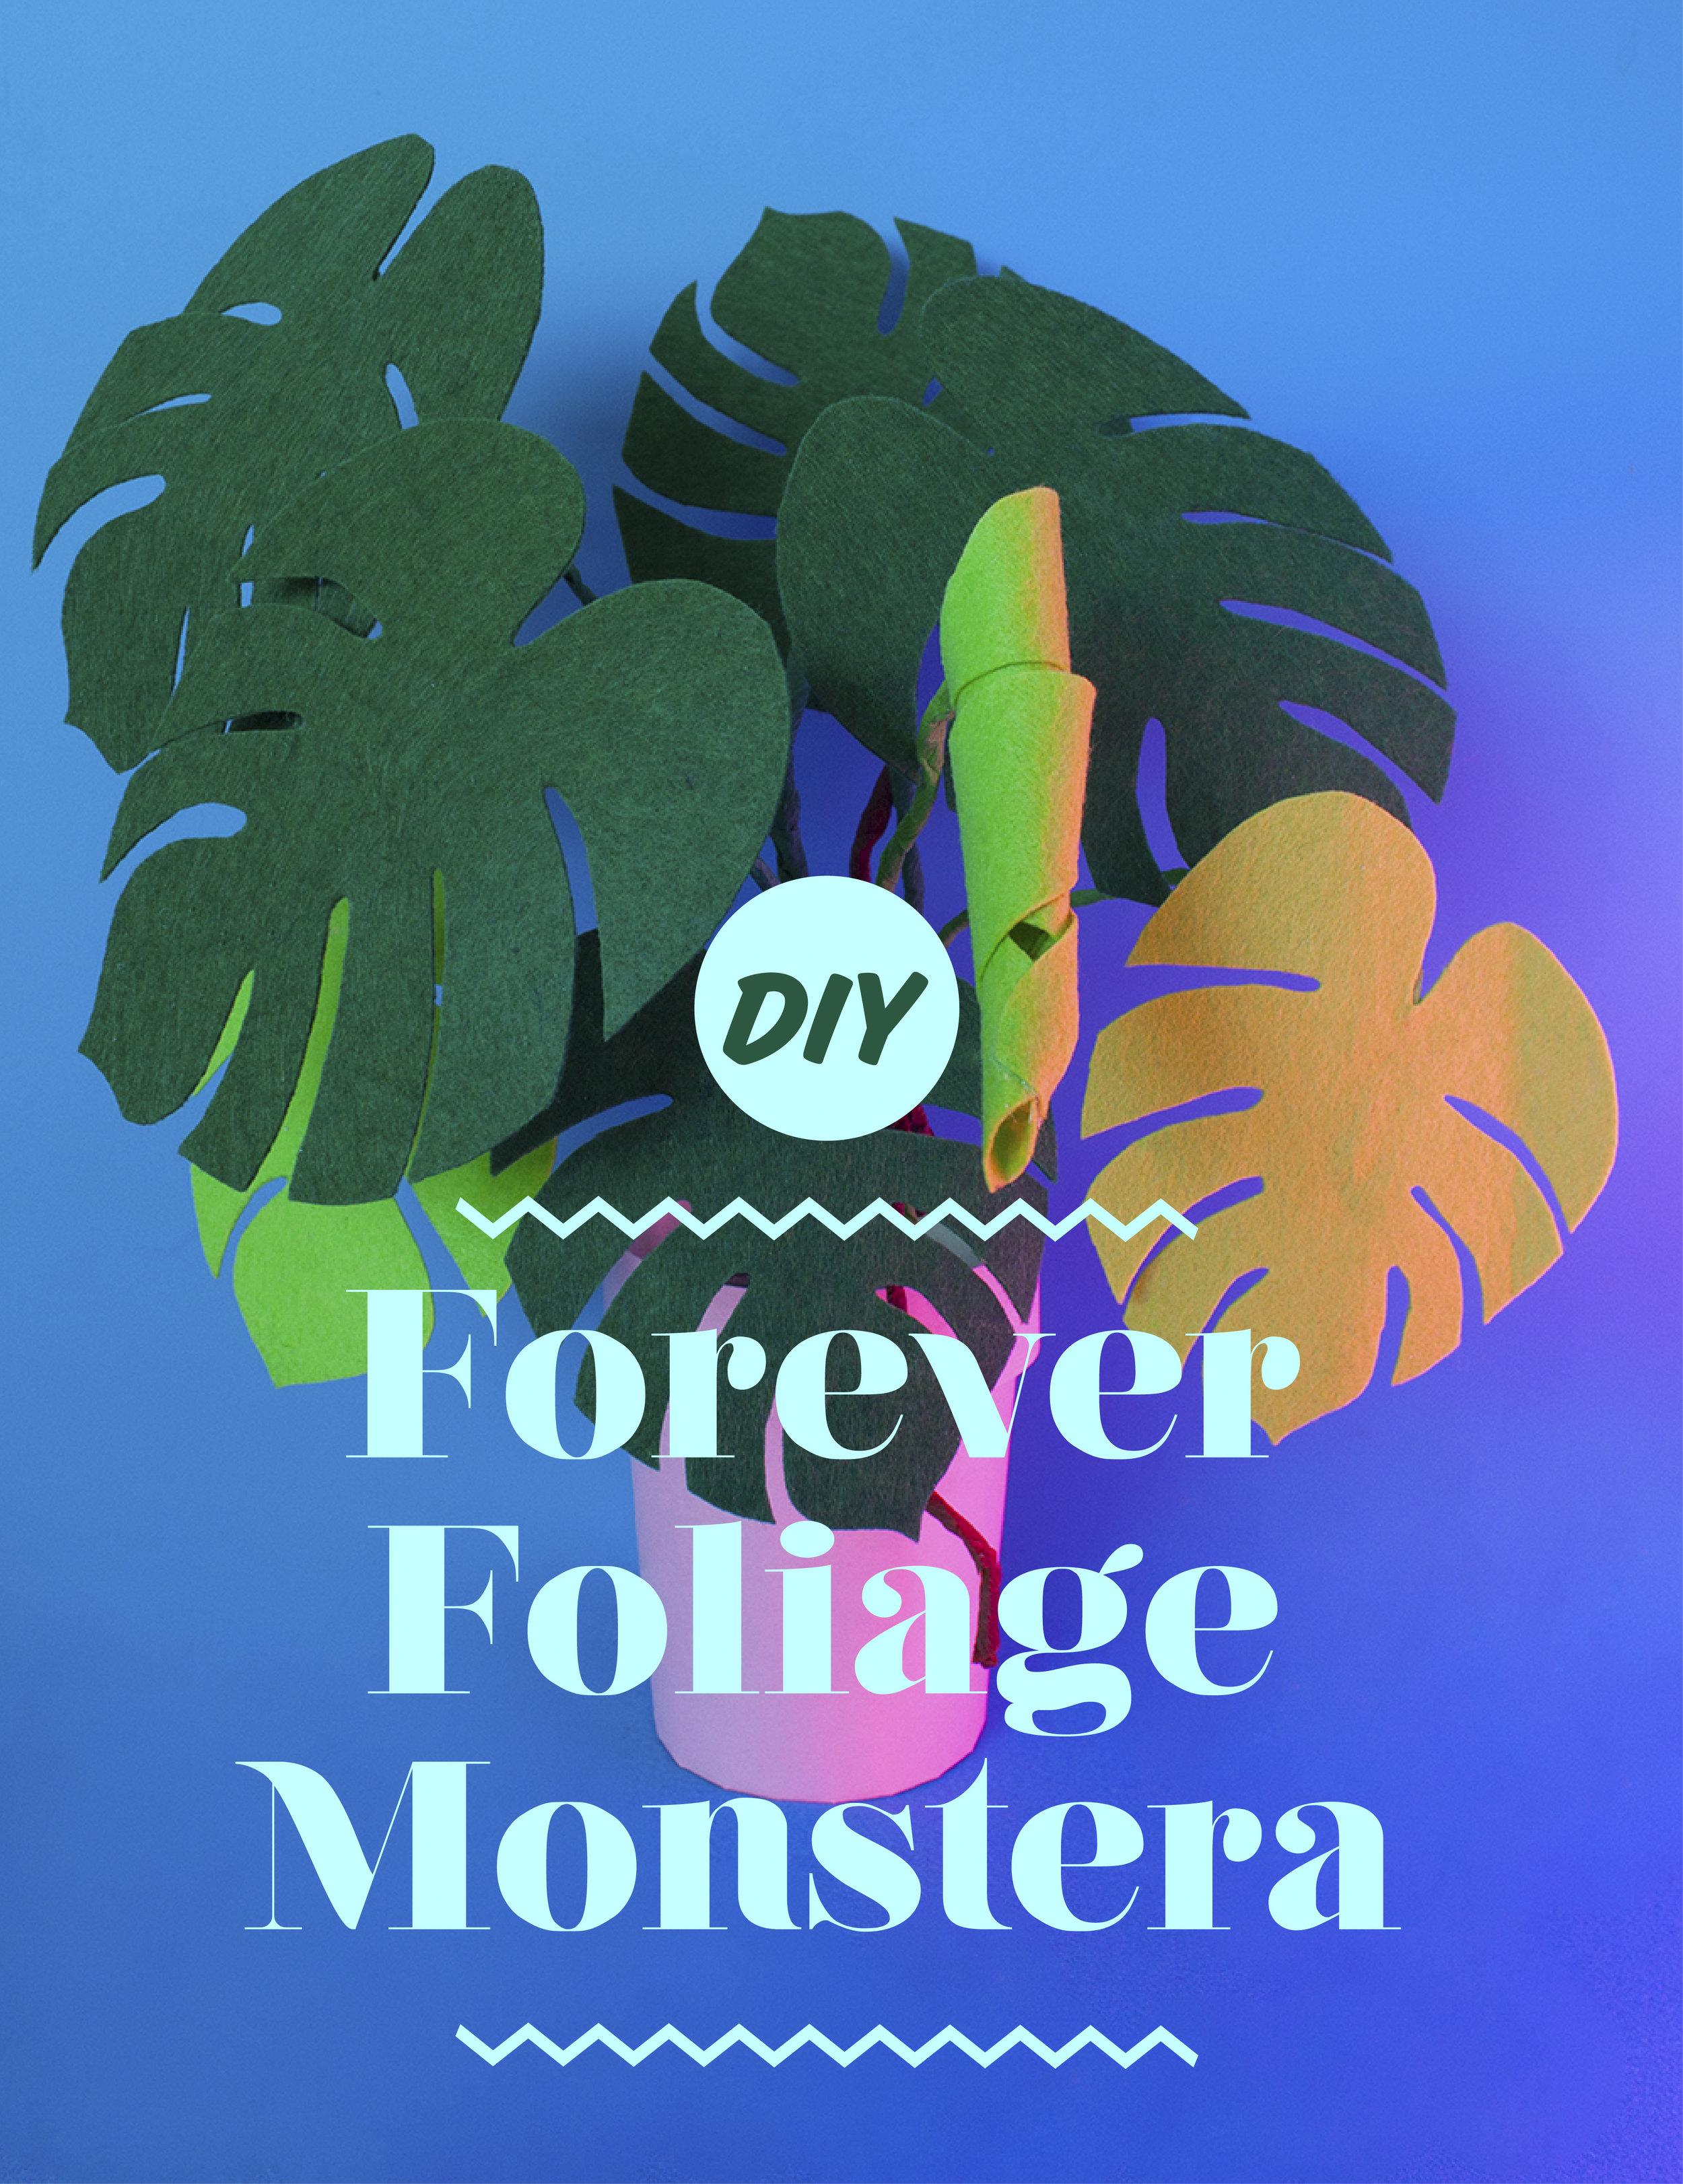 DIY Forever Foliage Monstera by Kitiya Palaskas.jpg